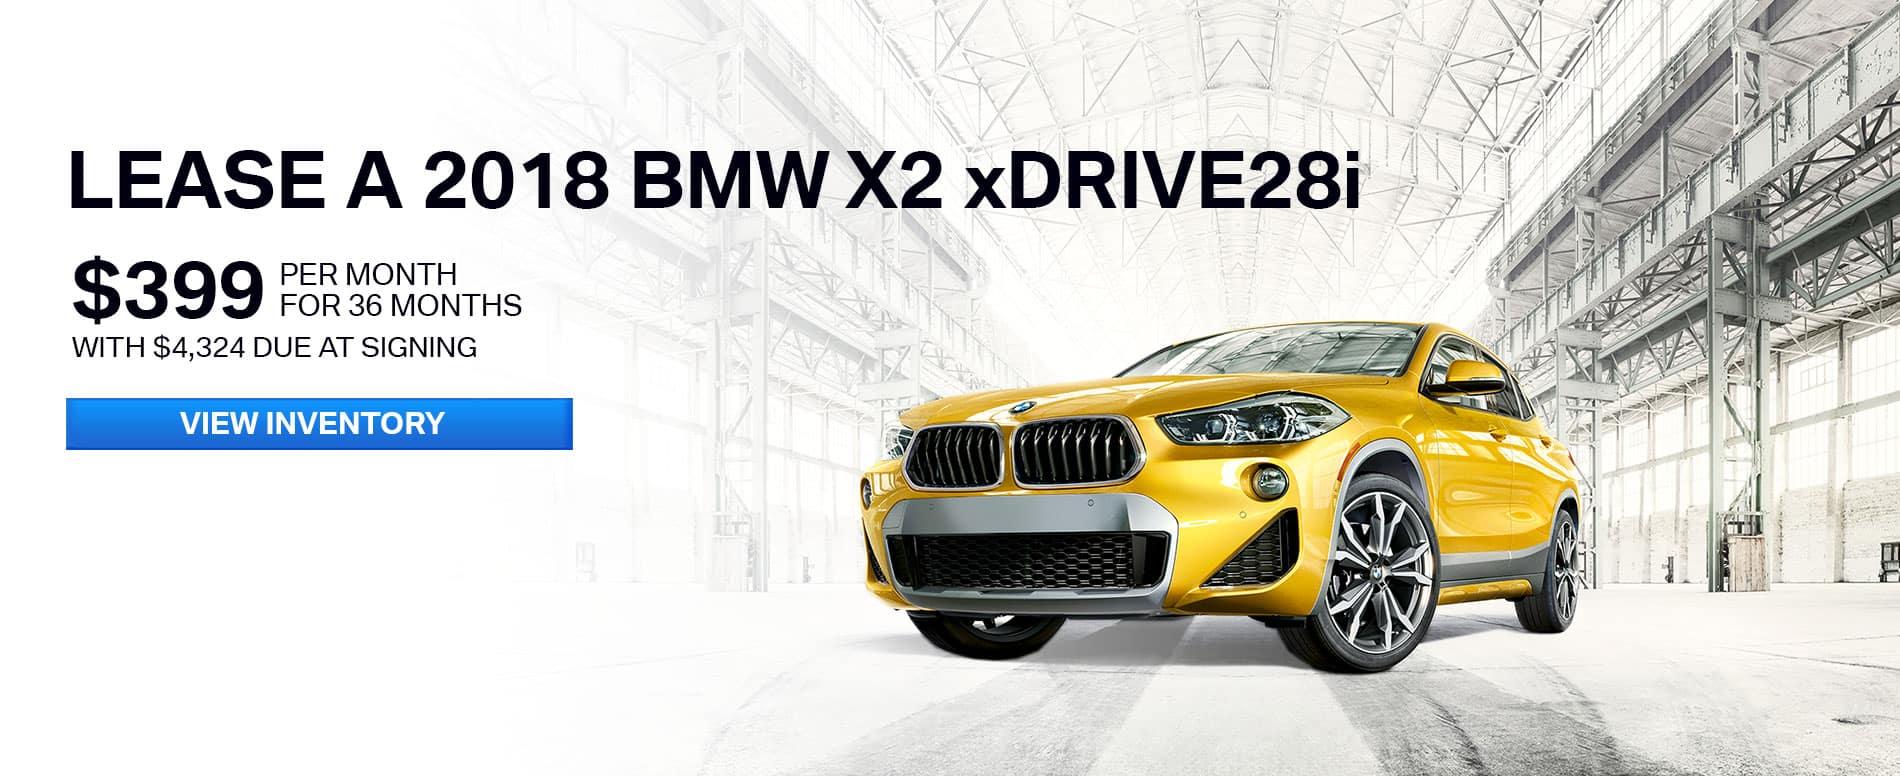 BMW X2 Offer June 2018